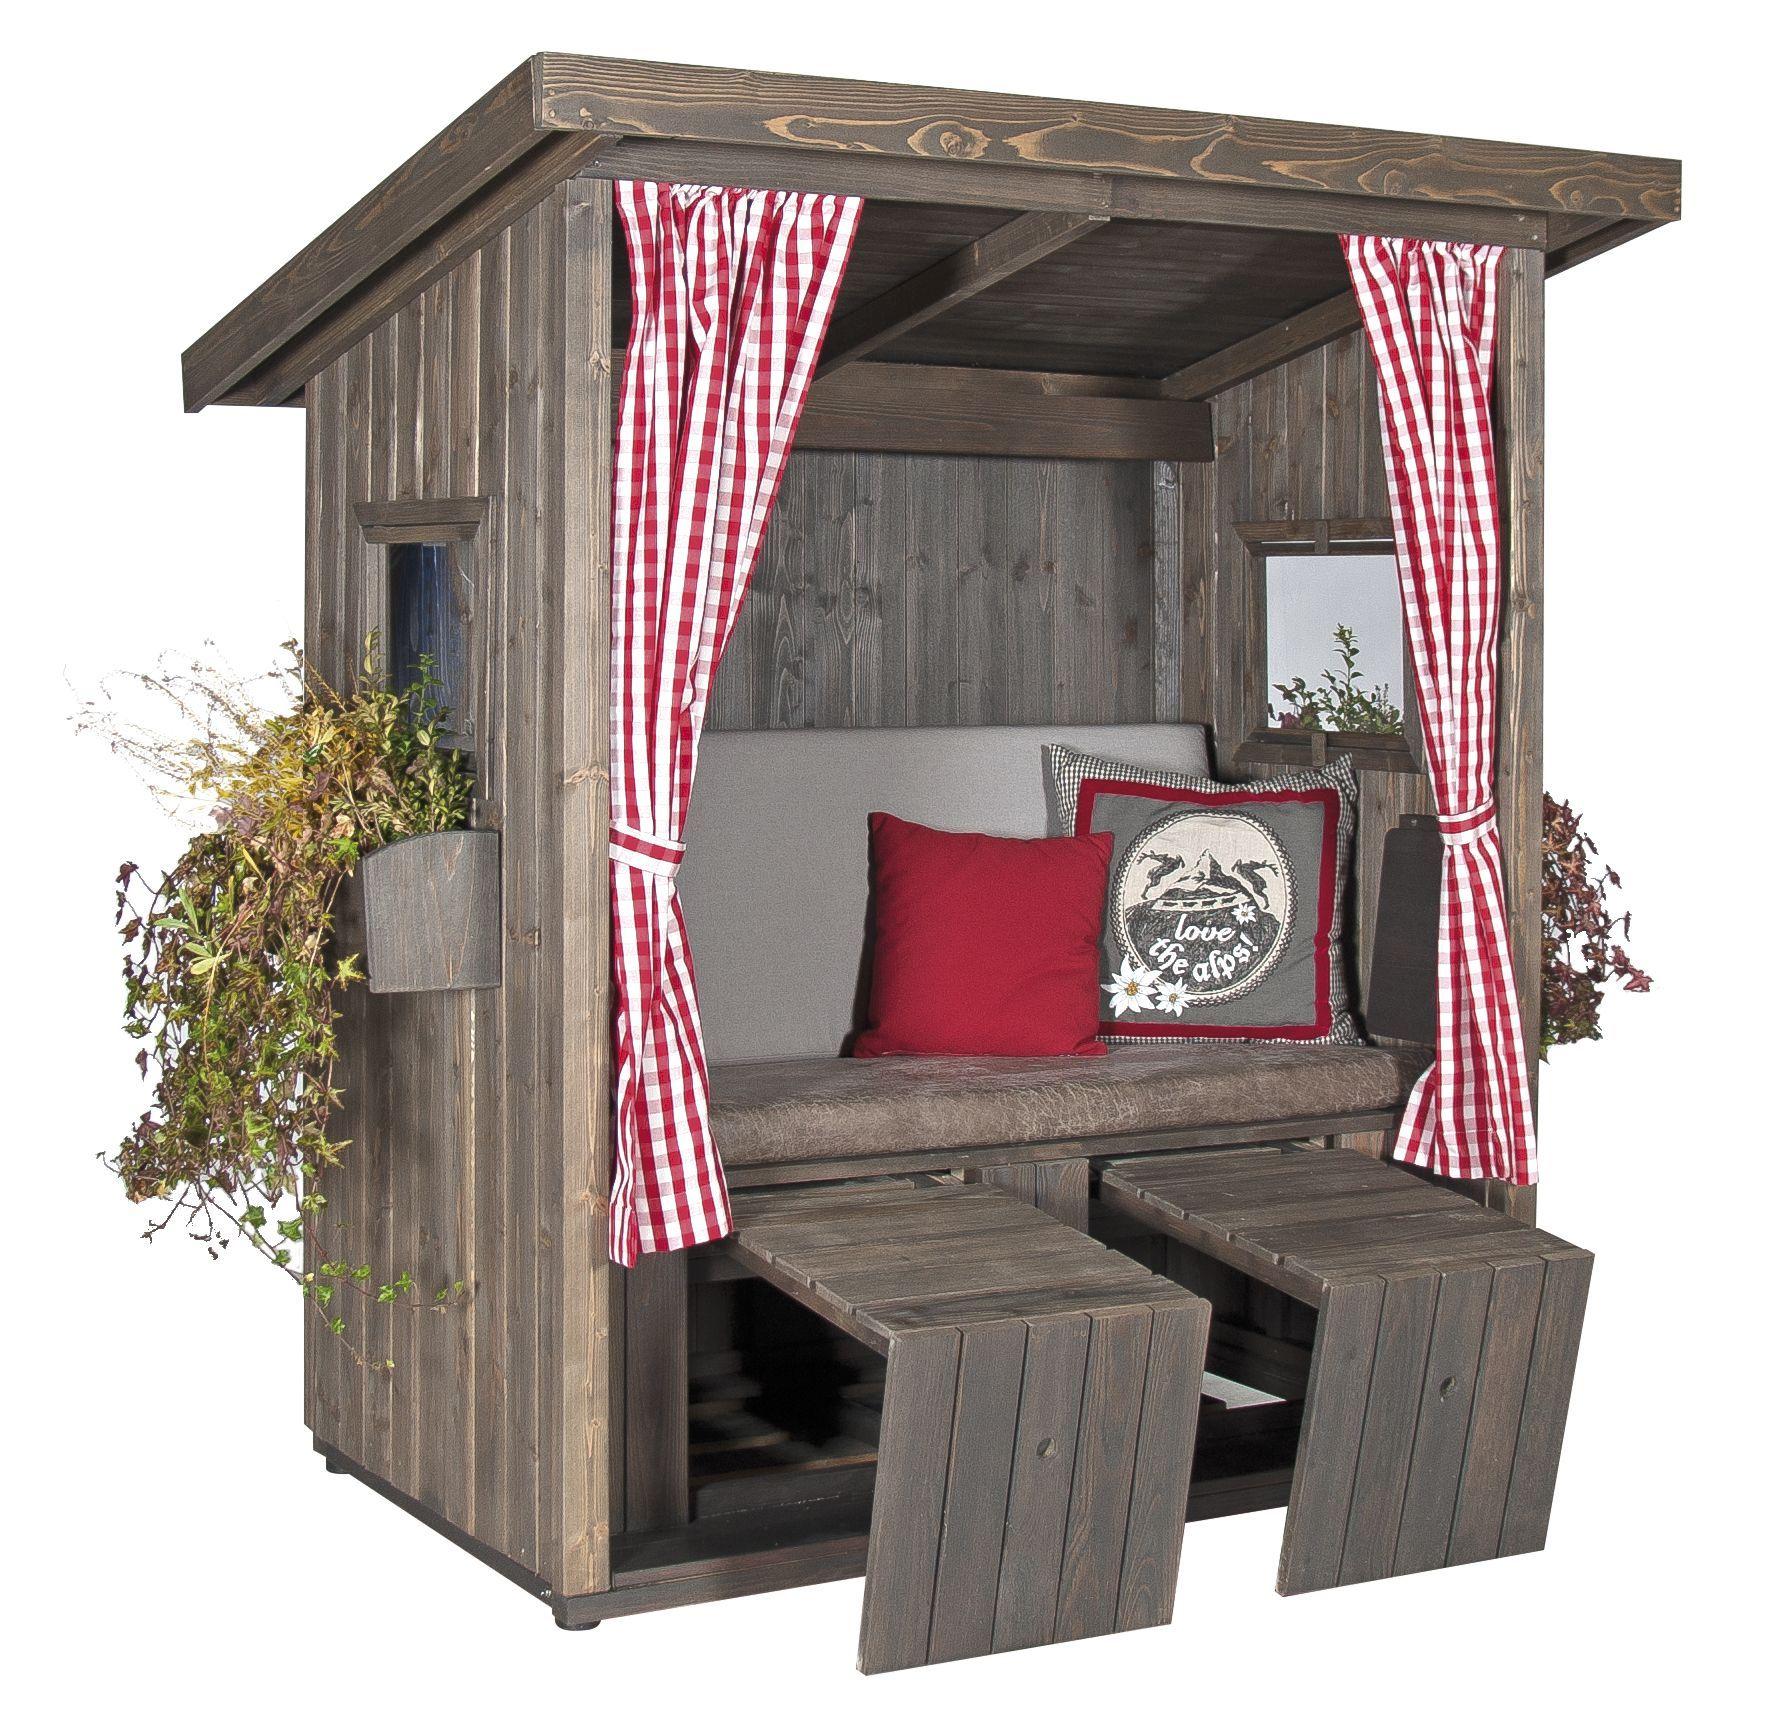 Zweisitzerholzhtte Gartenloungehtte Gartenbank Berdachte Bequemen Fusttzen Als Mitgar Pallet Furniture Outdoor Outdoor Decor Backyard Outdoor Furniture